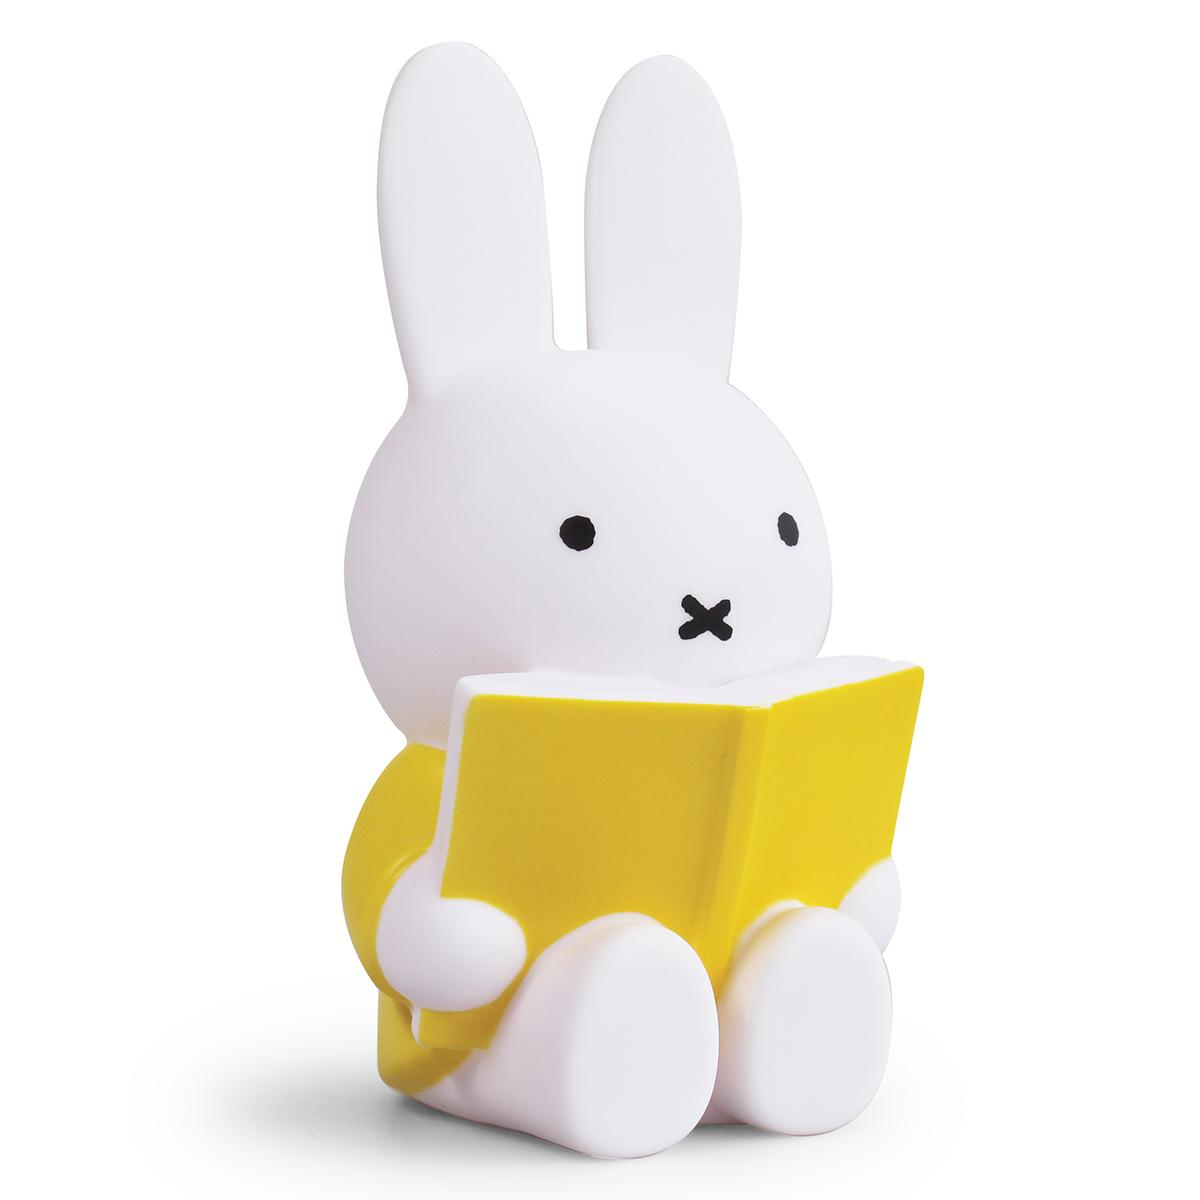 Tirelire Tirelire Miffy Livre - Jaune Tirelire Miffy Livre - Jaune